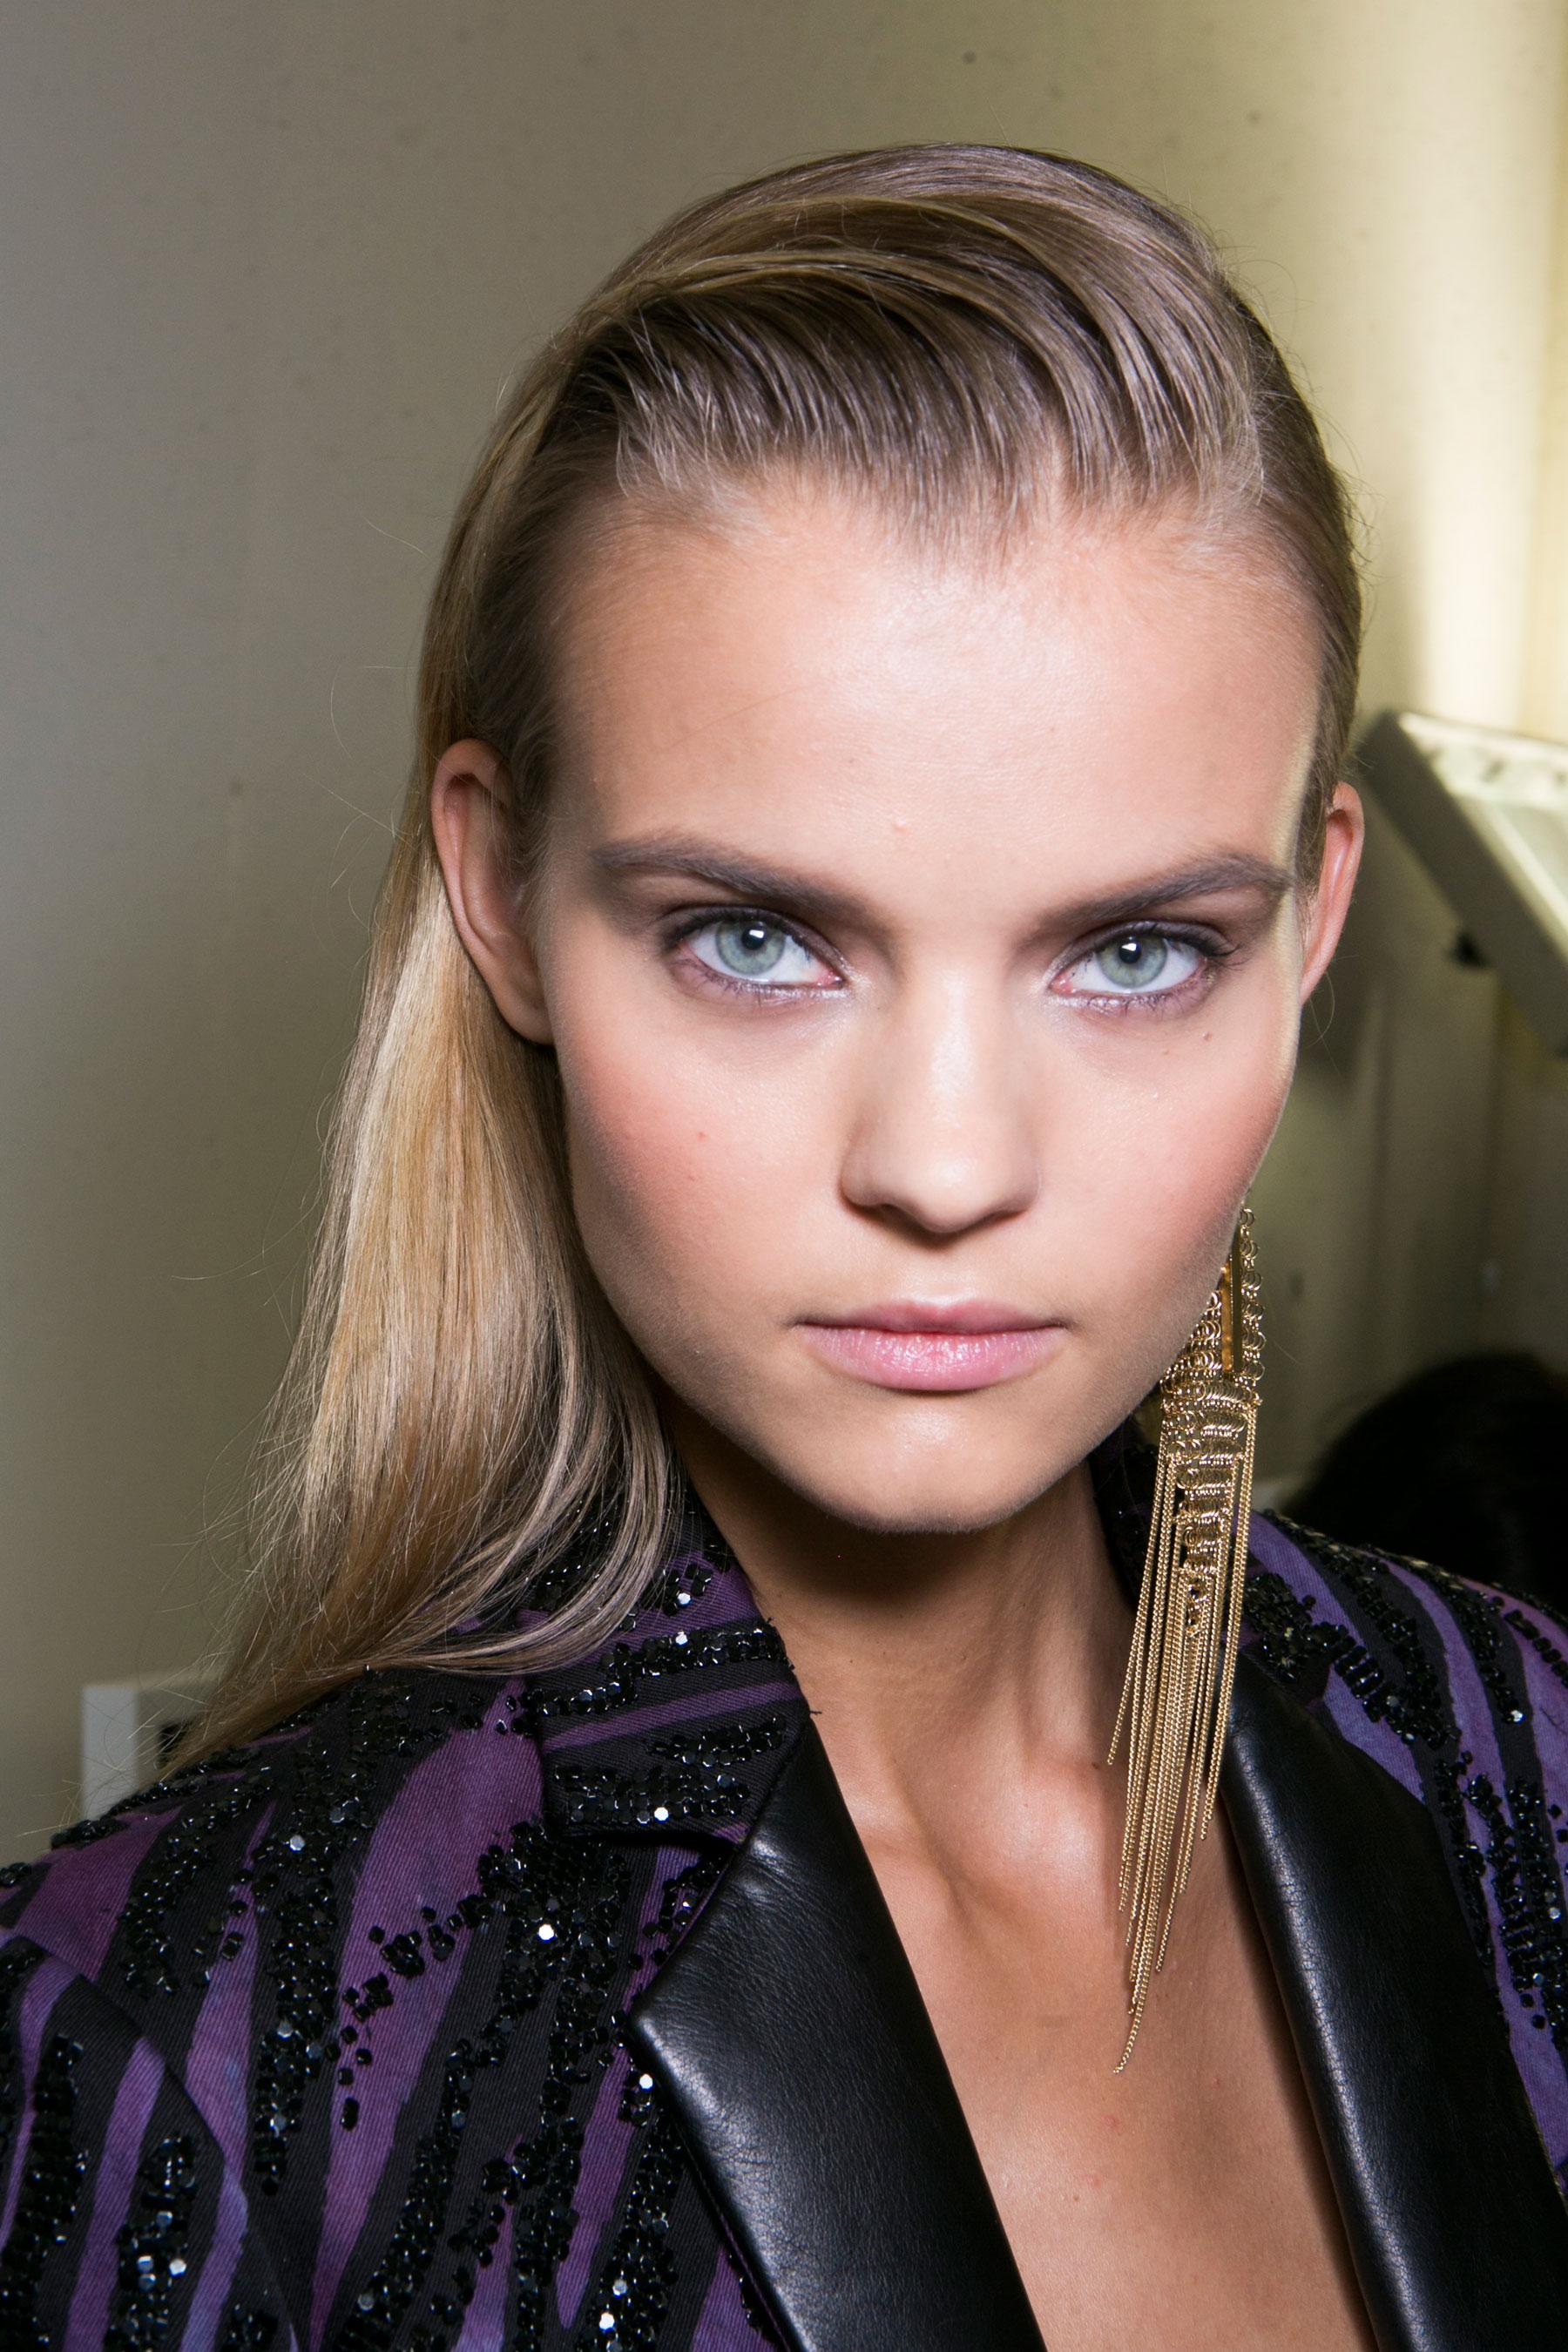 Roberto-Cavalli-Backstage-beauty-spring-2016-close-up-fashion-show-the-impression-051